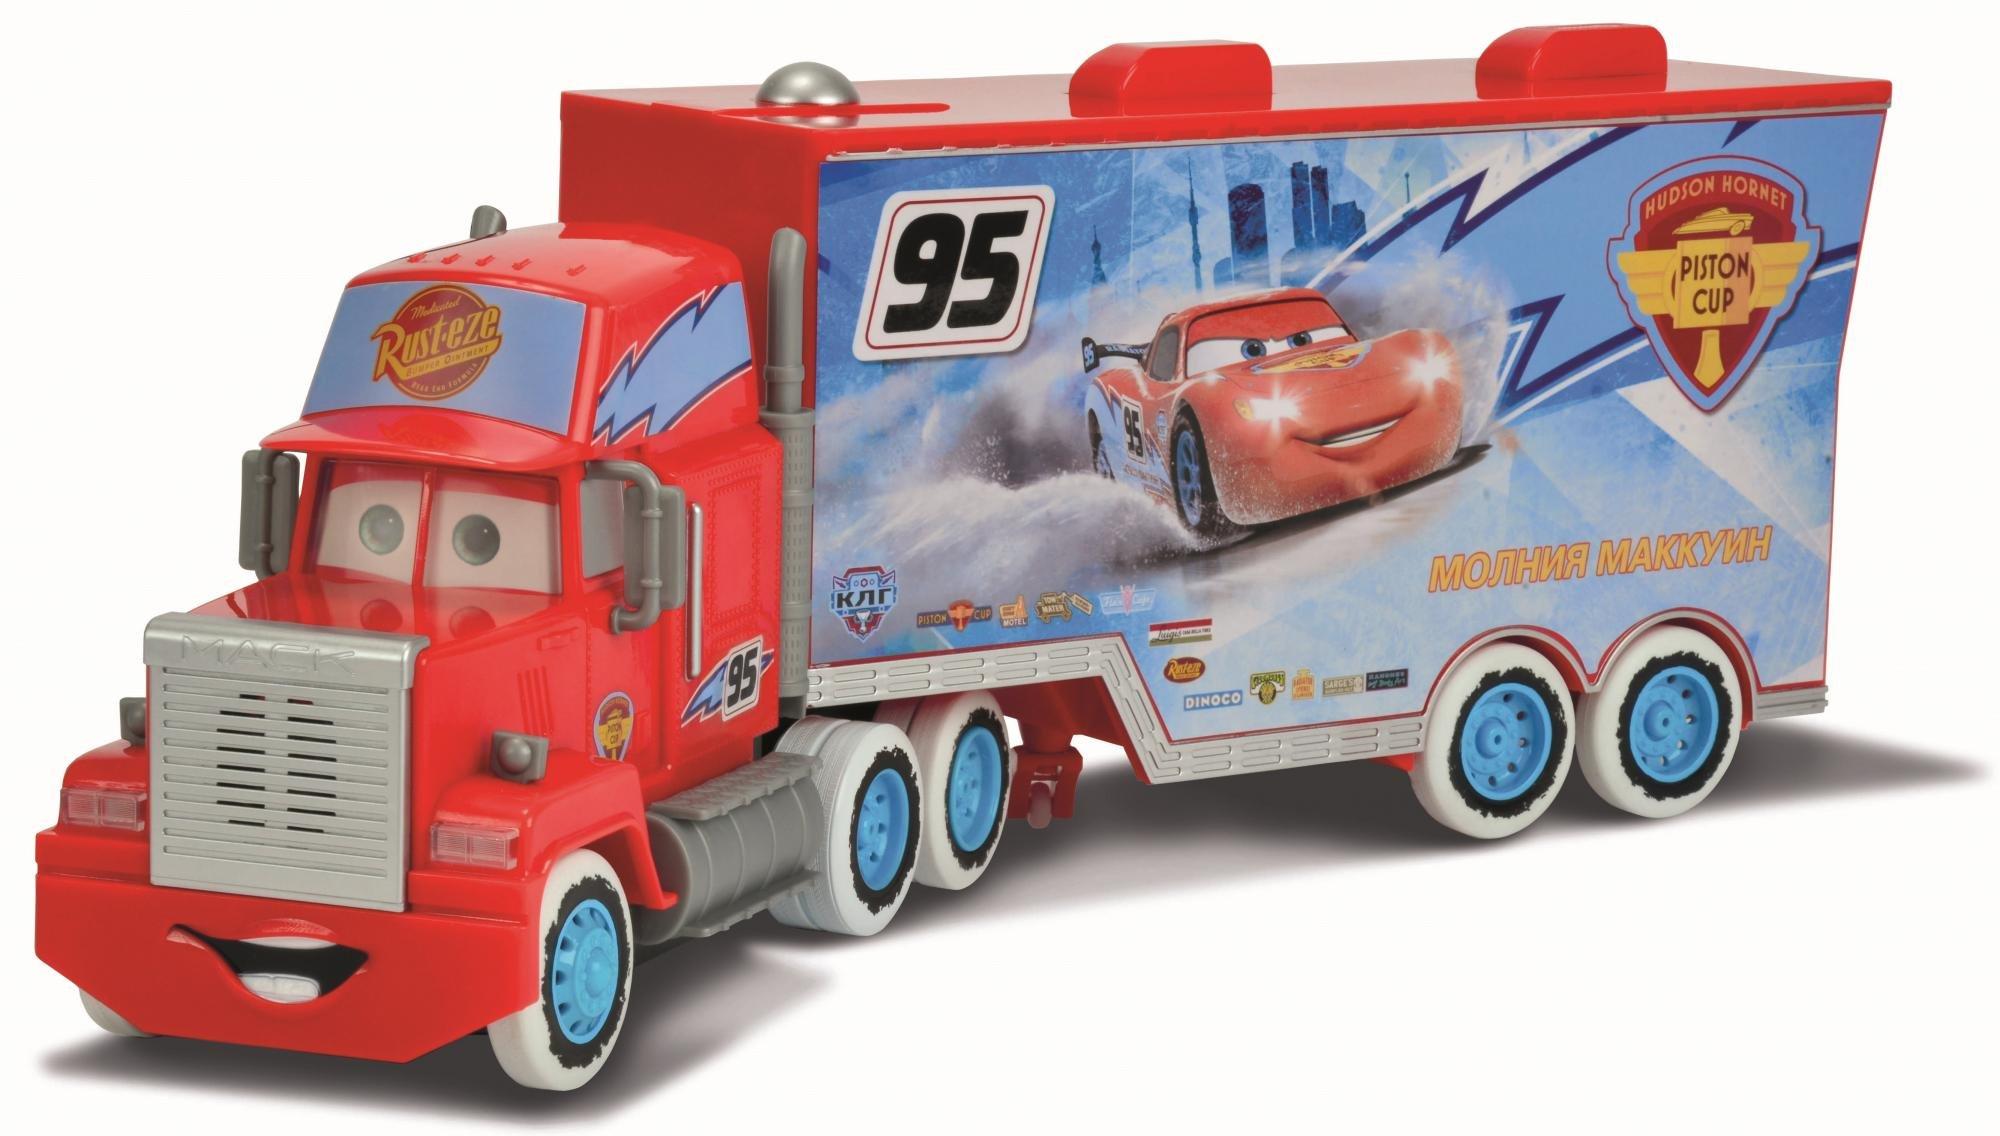 Ciężarówka RC Turbo Mack Truck Ice Racing za 99zł @ Mall